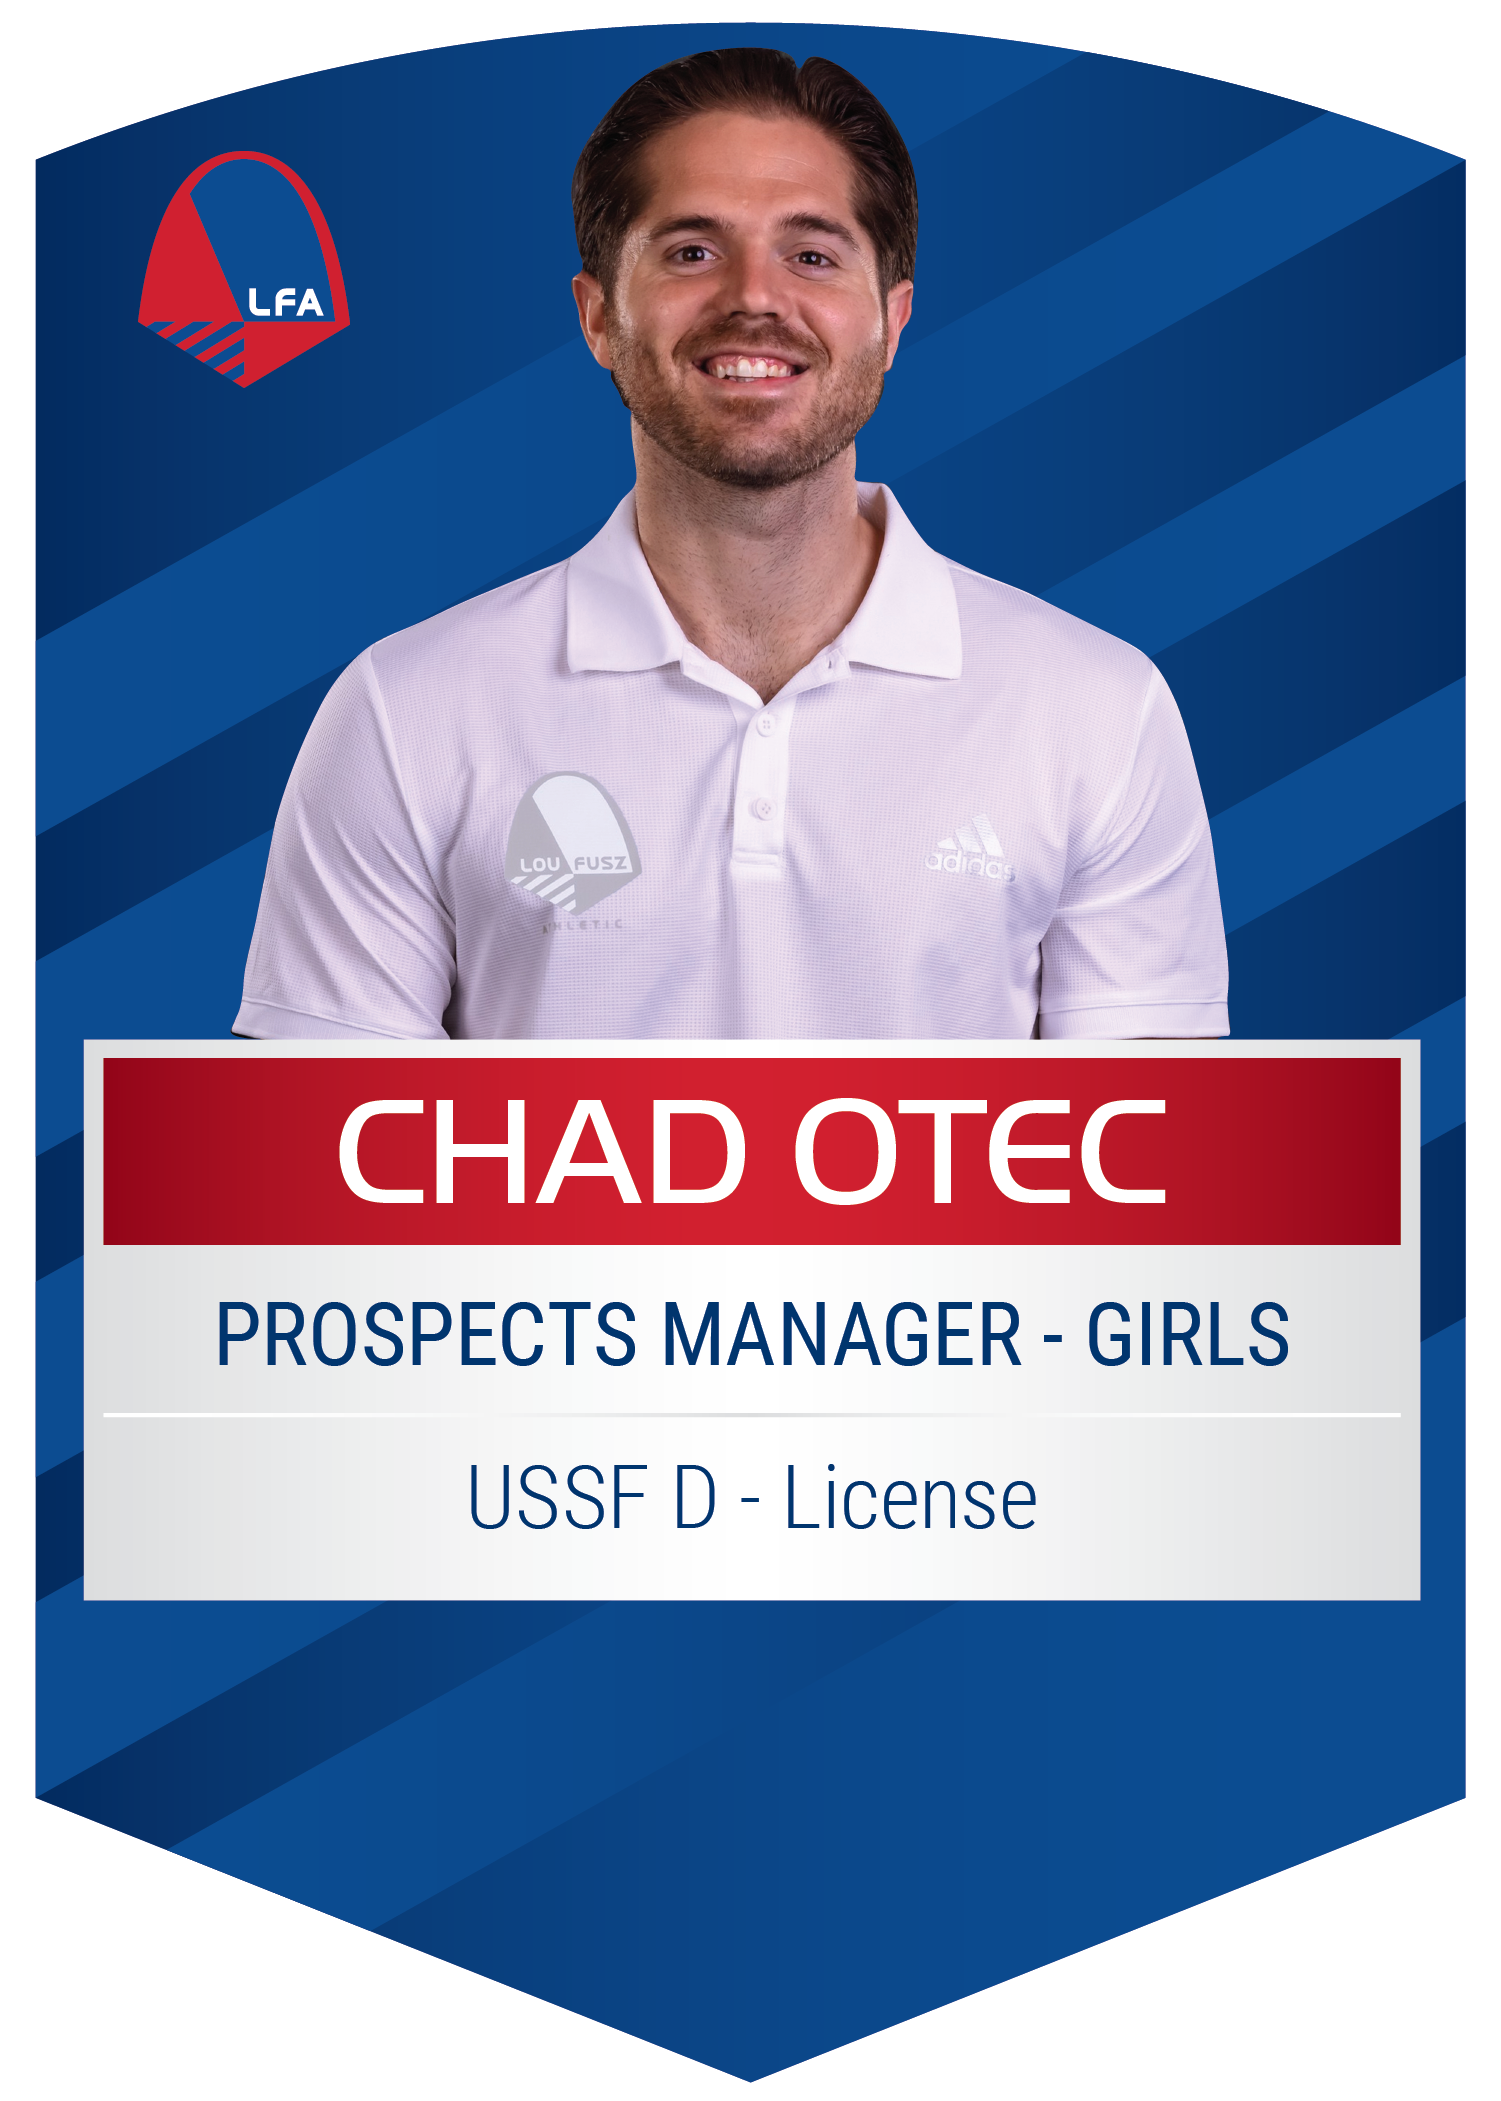 Chad Otec